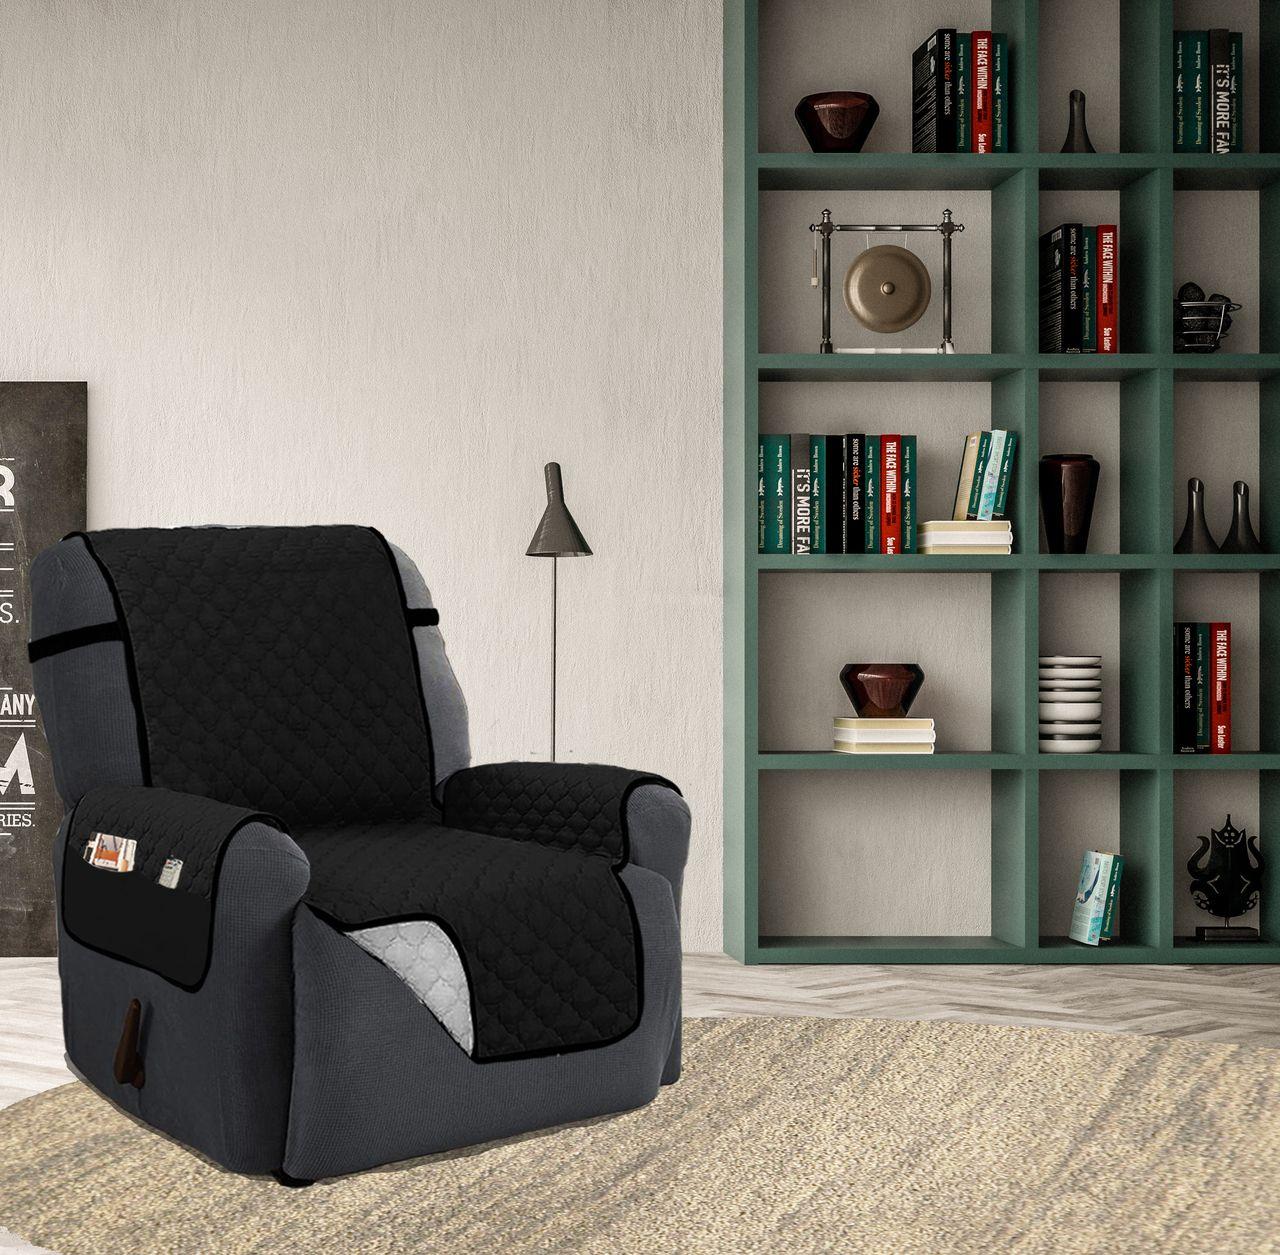 Fabulous Quilted Reversible Microfiber Furniture Recliner Pet Spiritservingveterans Wood Chair Design Ideas Spiritservingveteransorg